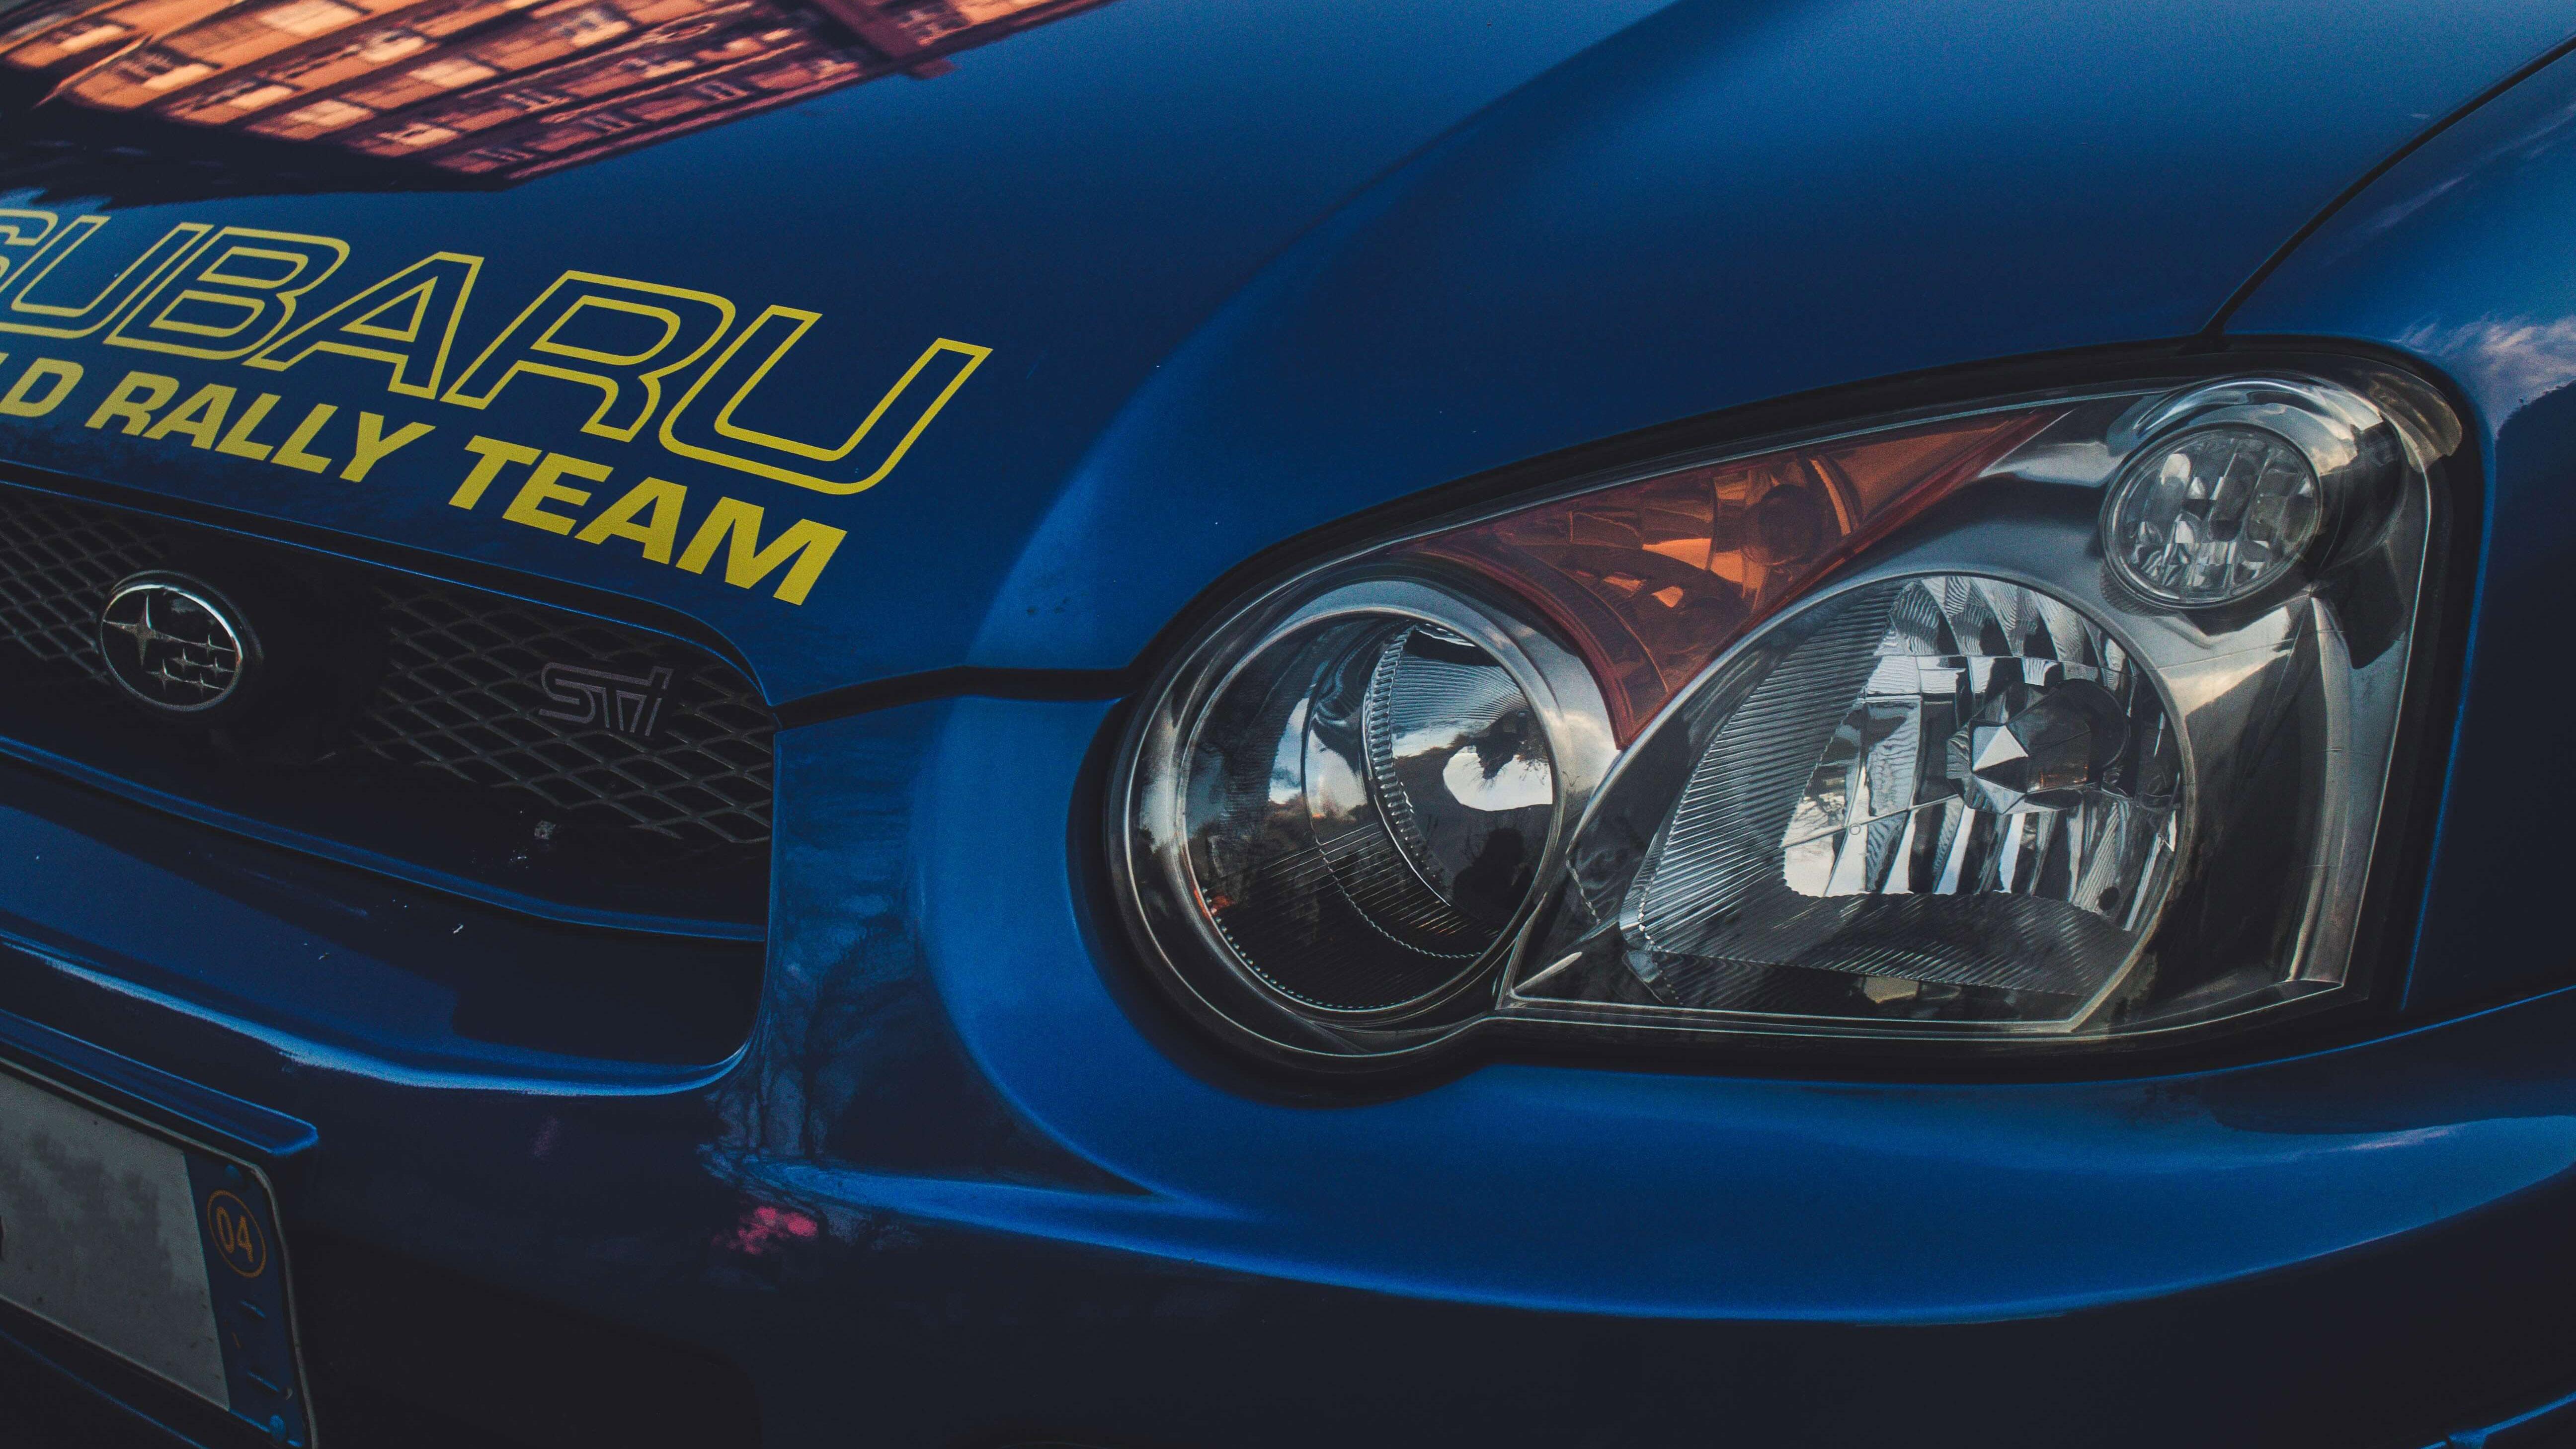 Subaru Impreza WRX STi Insurance Header Image